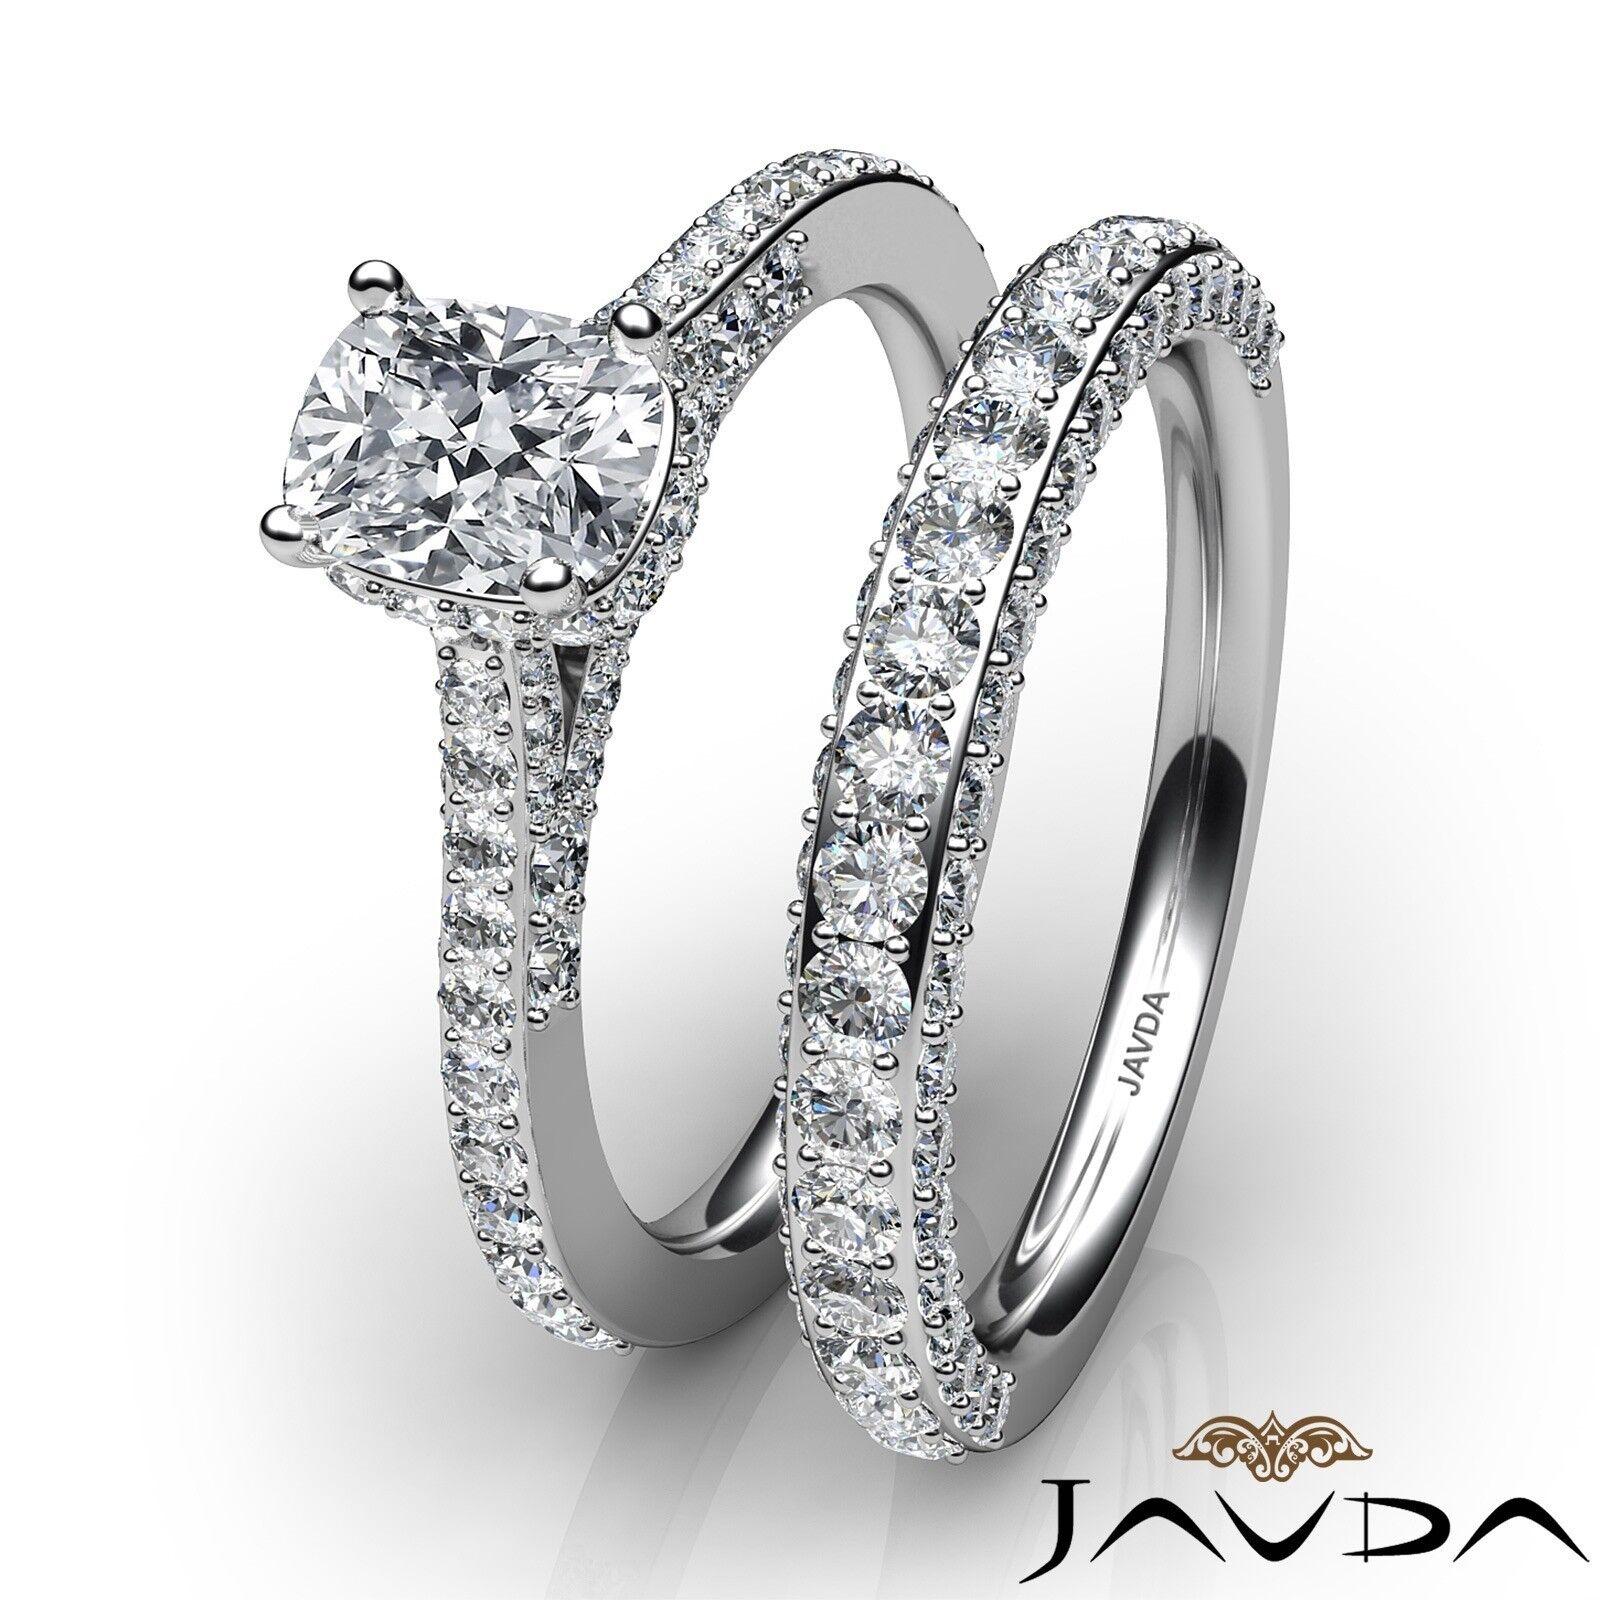 2.85ctw Pave Circa Halo Bridal Cushion Diamond Engagement Ring GIA F-VS1 W Gold 3